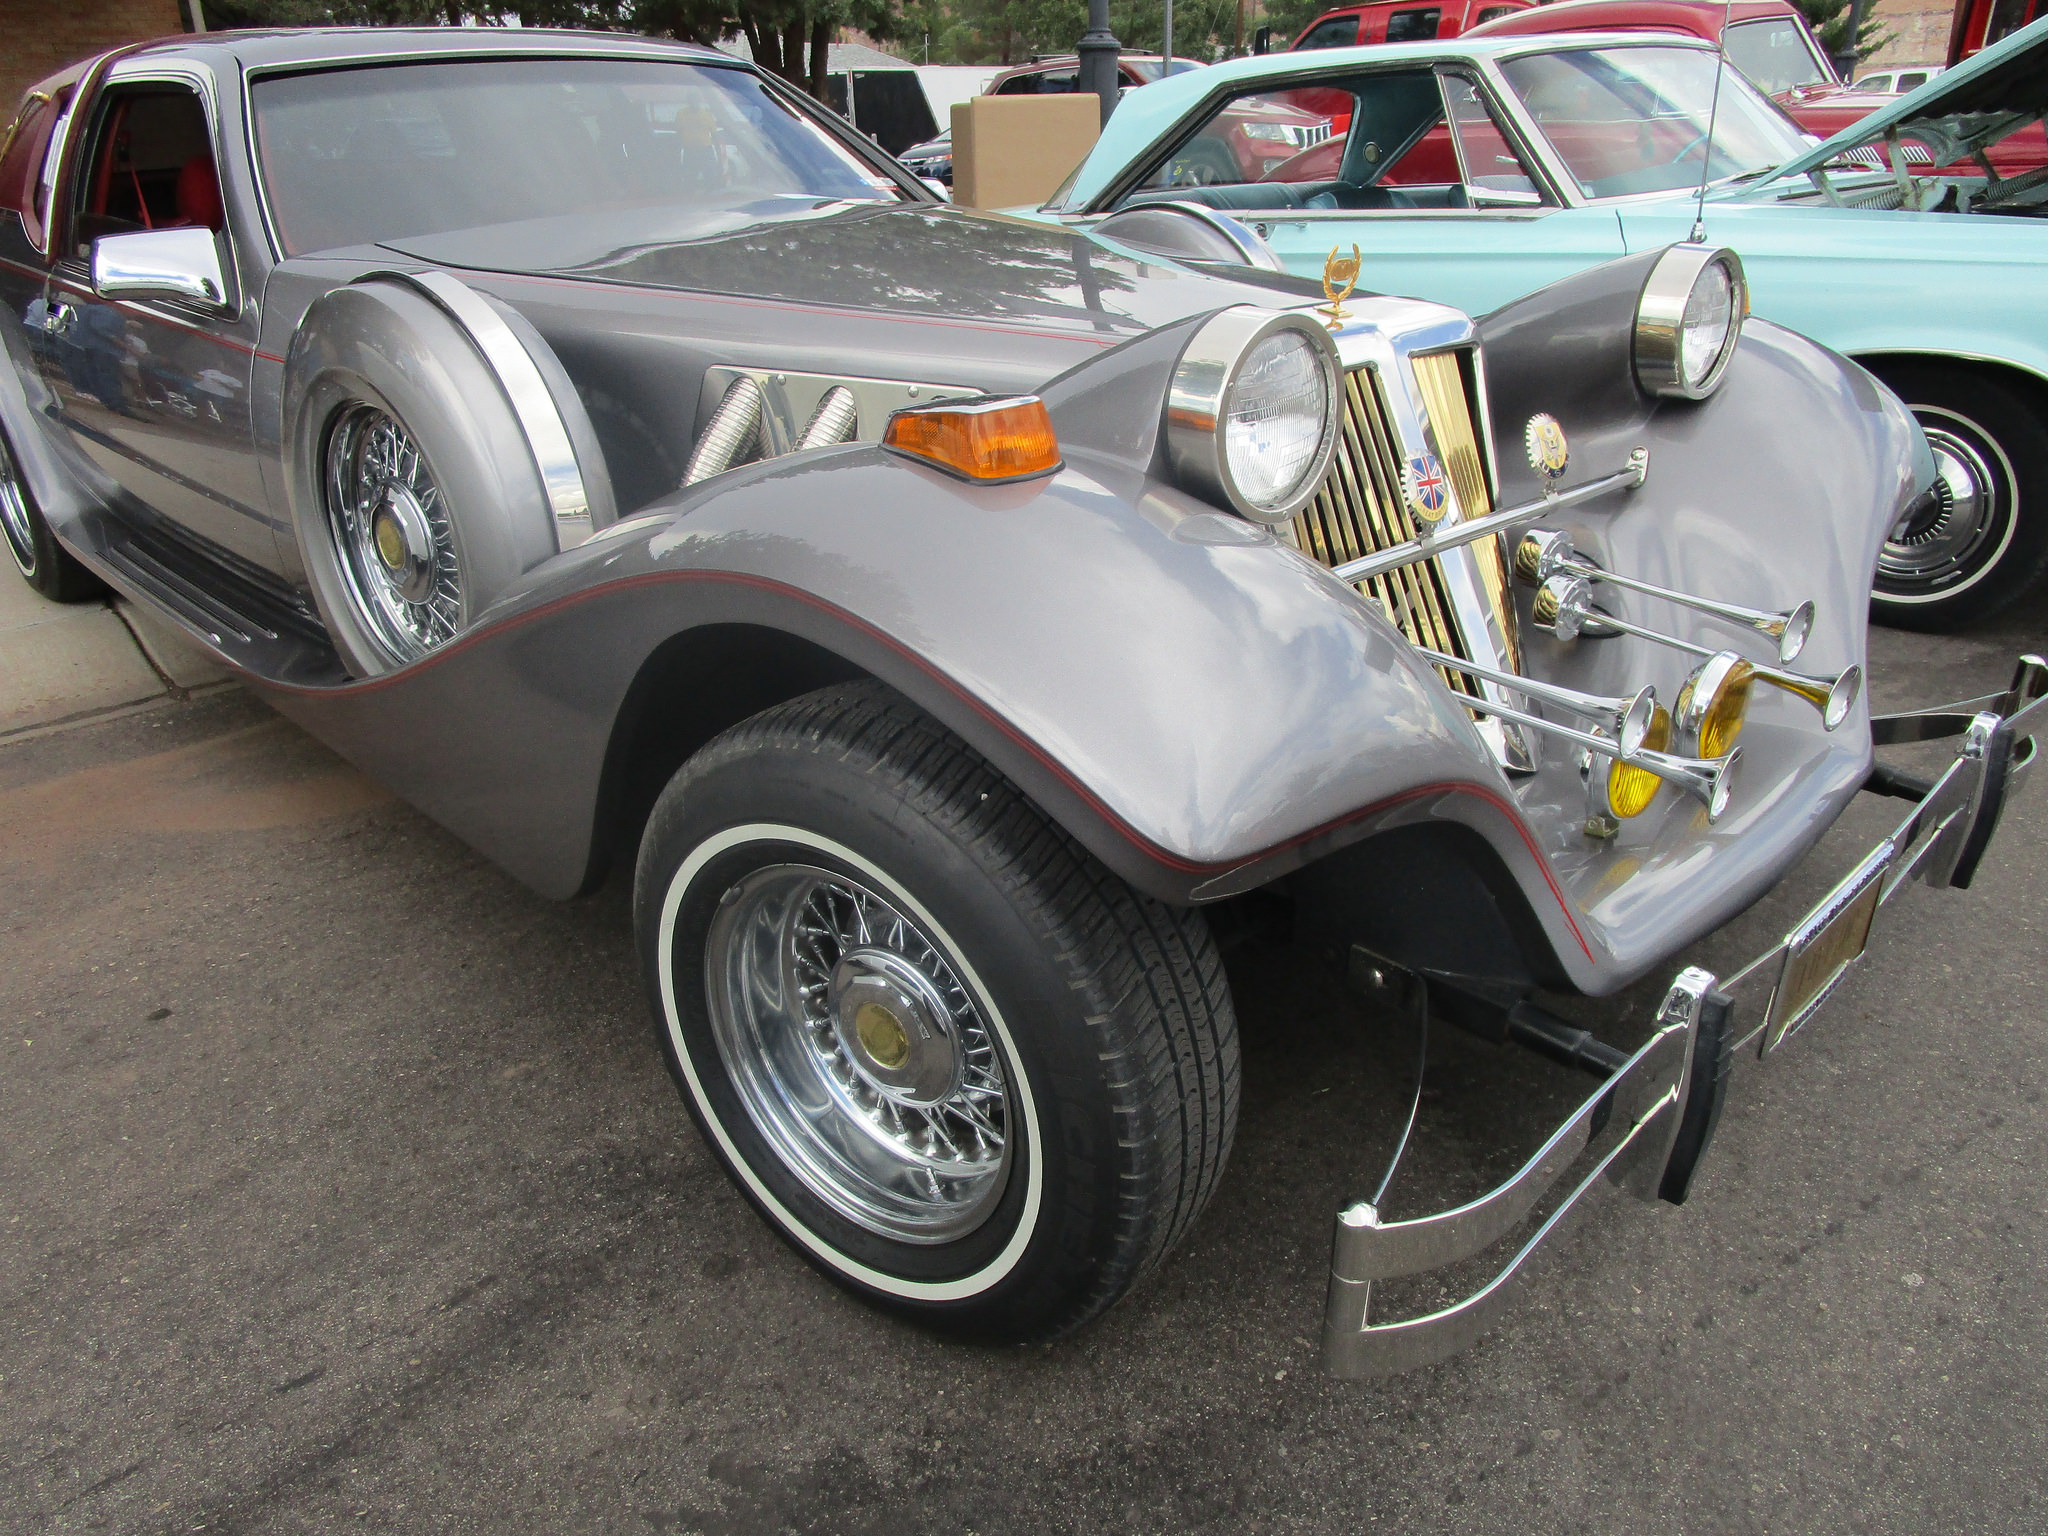 Bisbee Car Show Highlights Arizona News - Bisbee car show